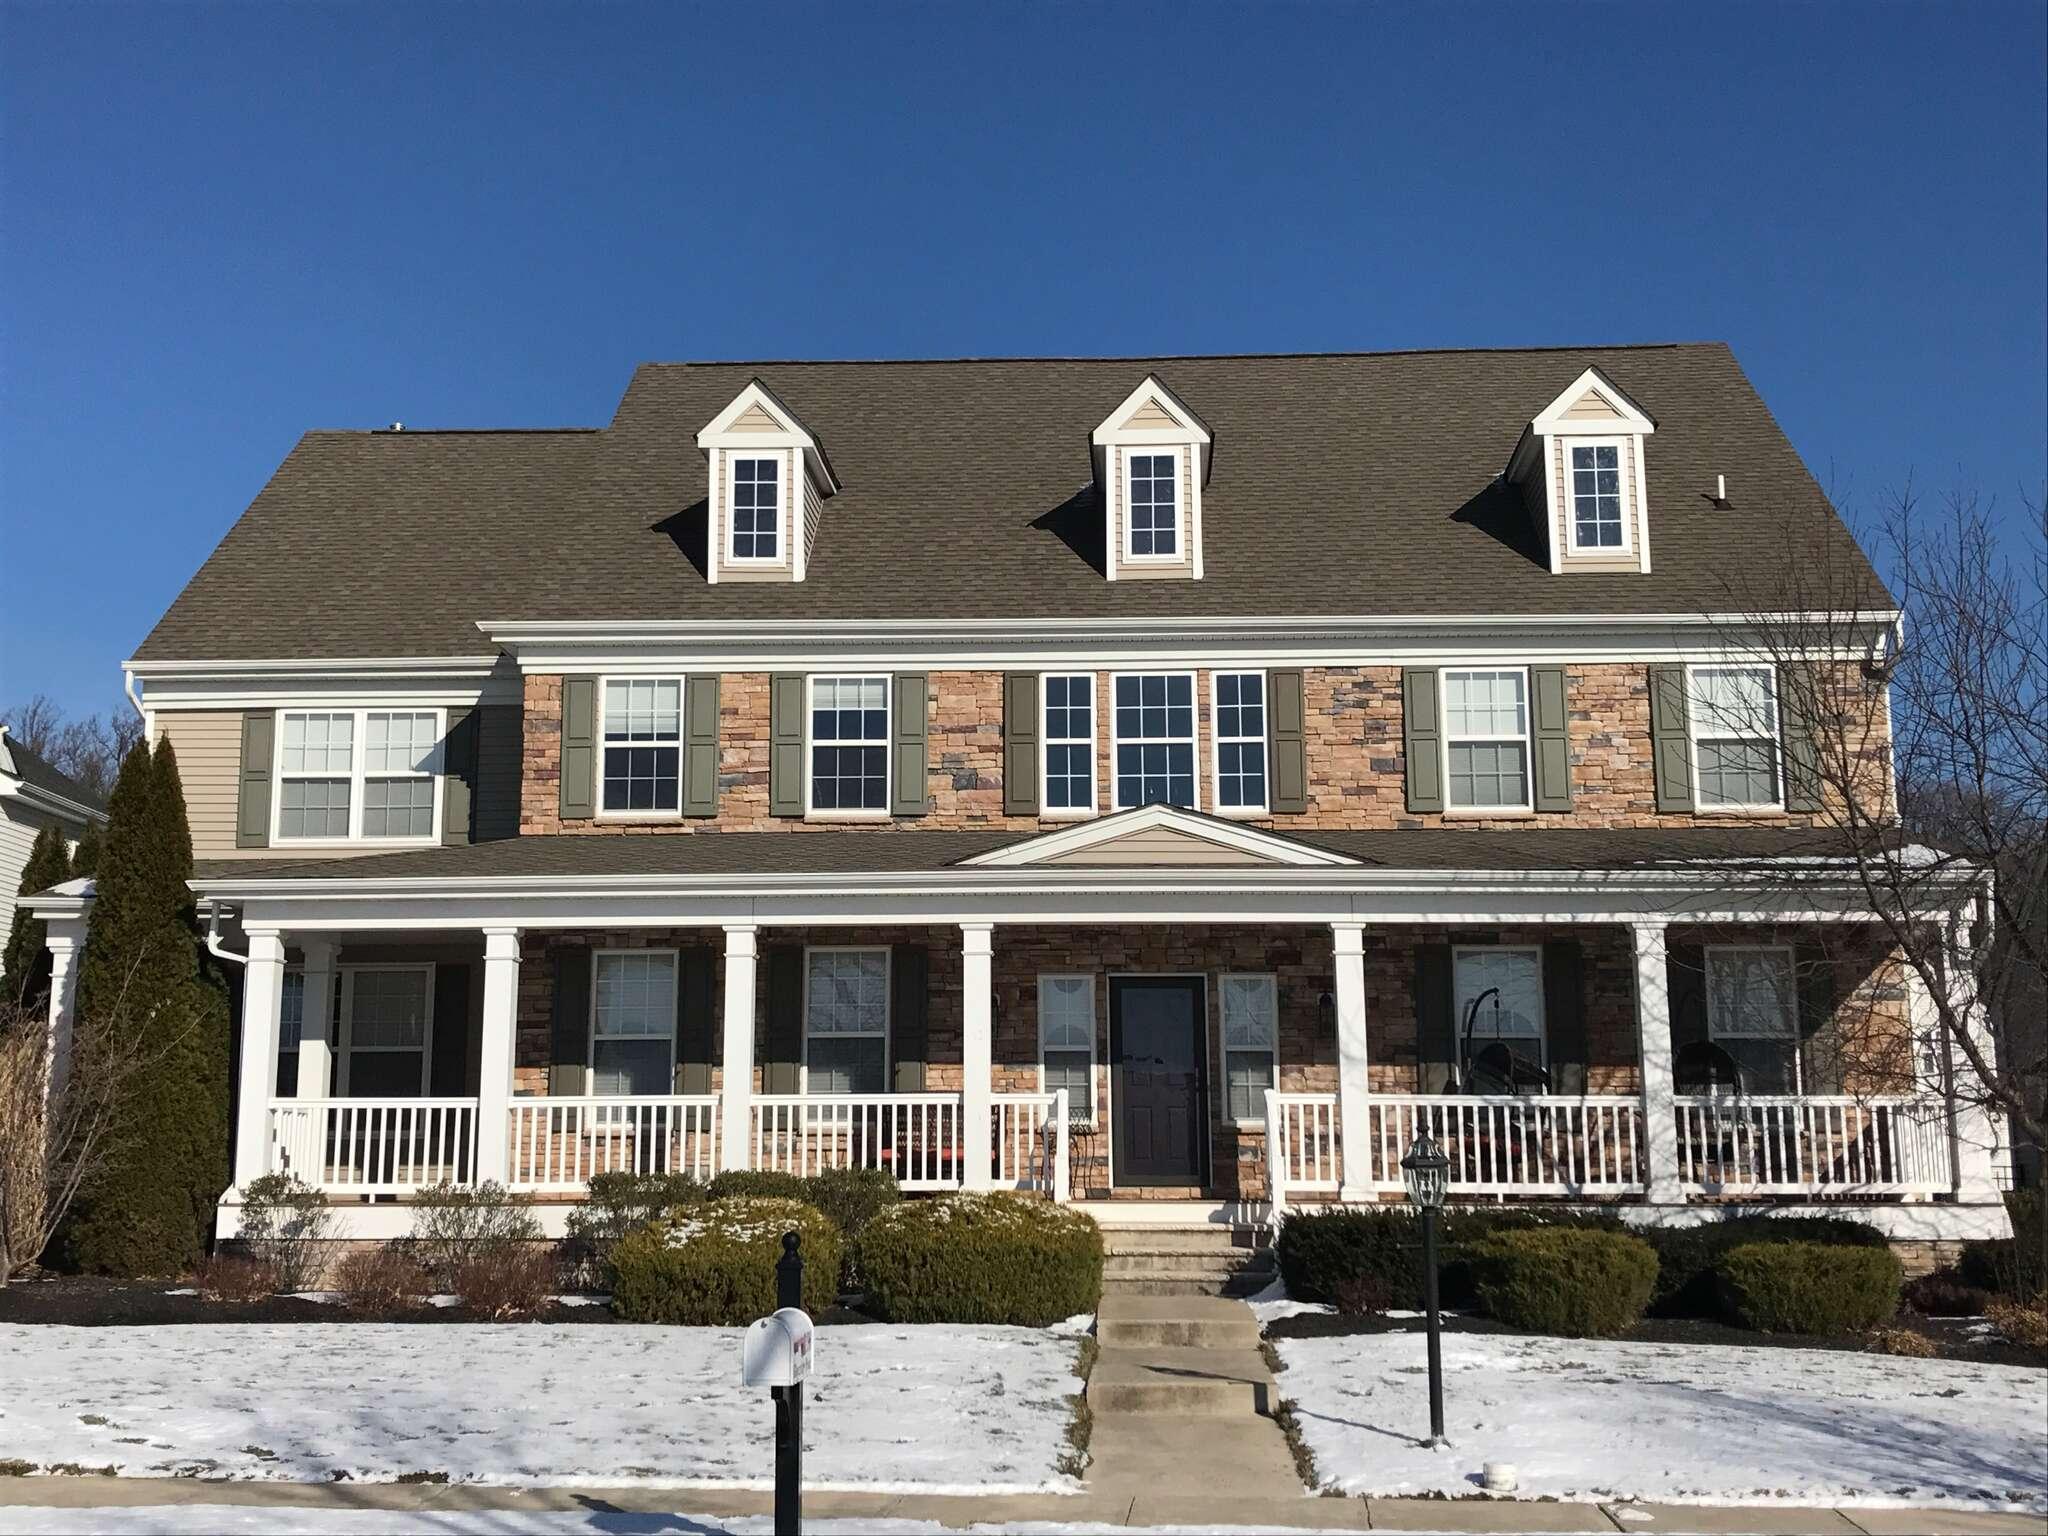 Single Family for Sale at 2196 Glenridge Rd Furlong, Pennsylvania 18925 United States